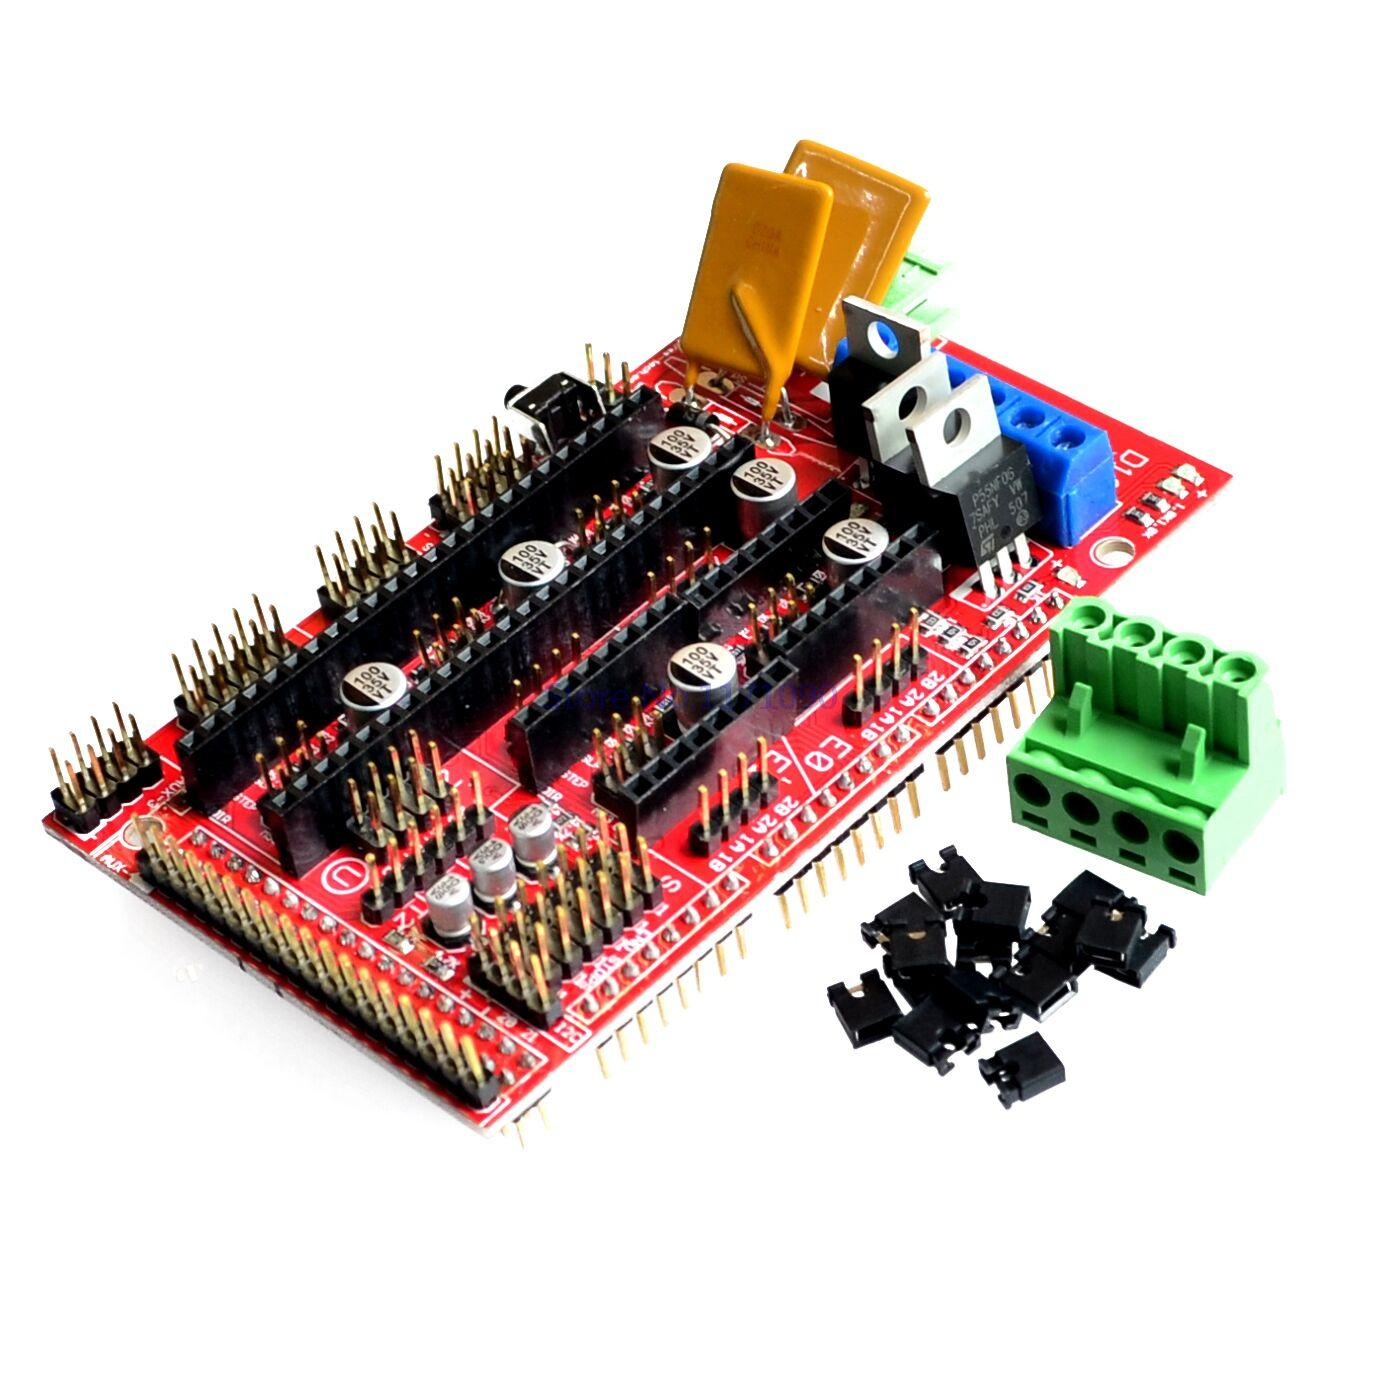 3D Printer Controller RAMPS 1.4 For Reprap Mendel Prusa I3 Arduino Boards C2L7